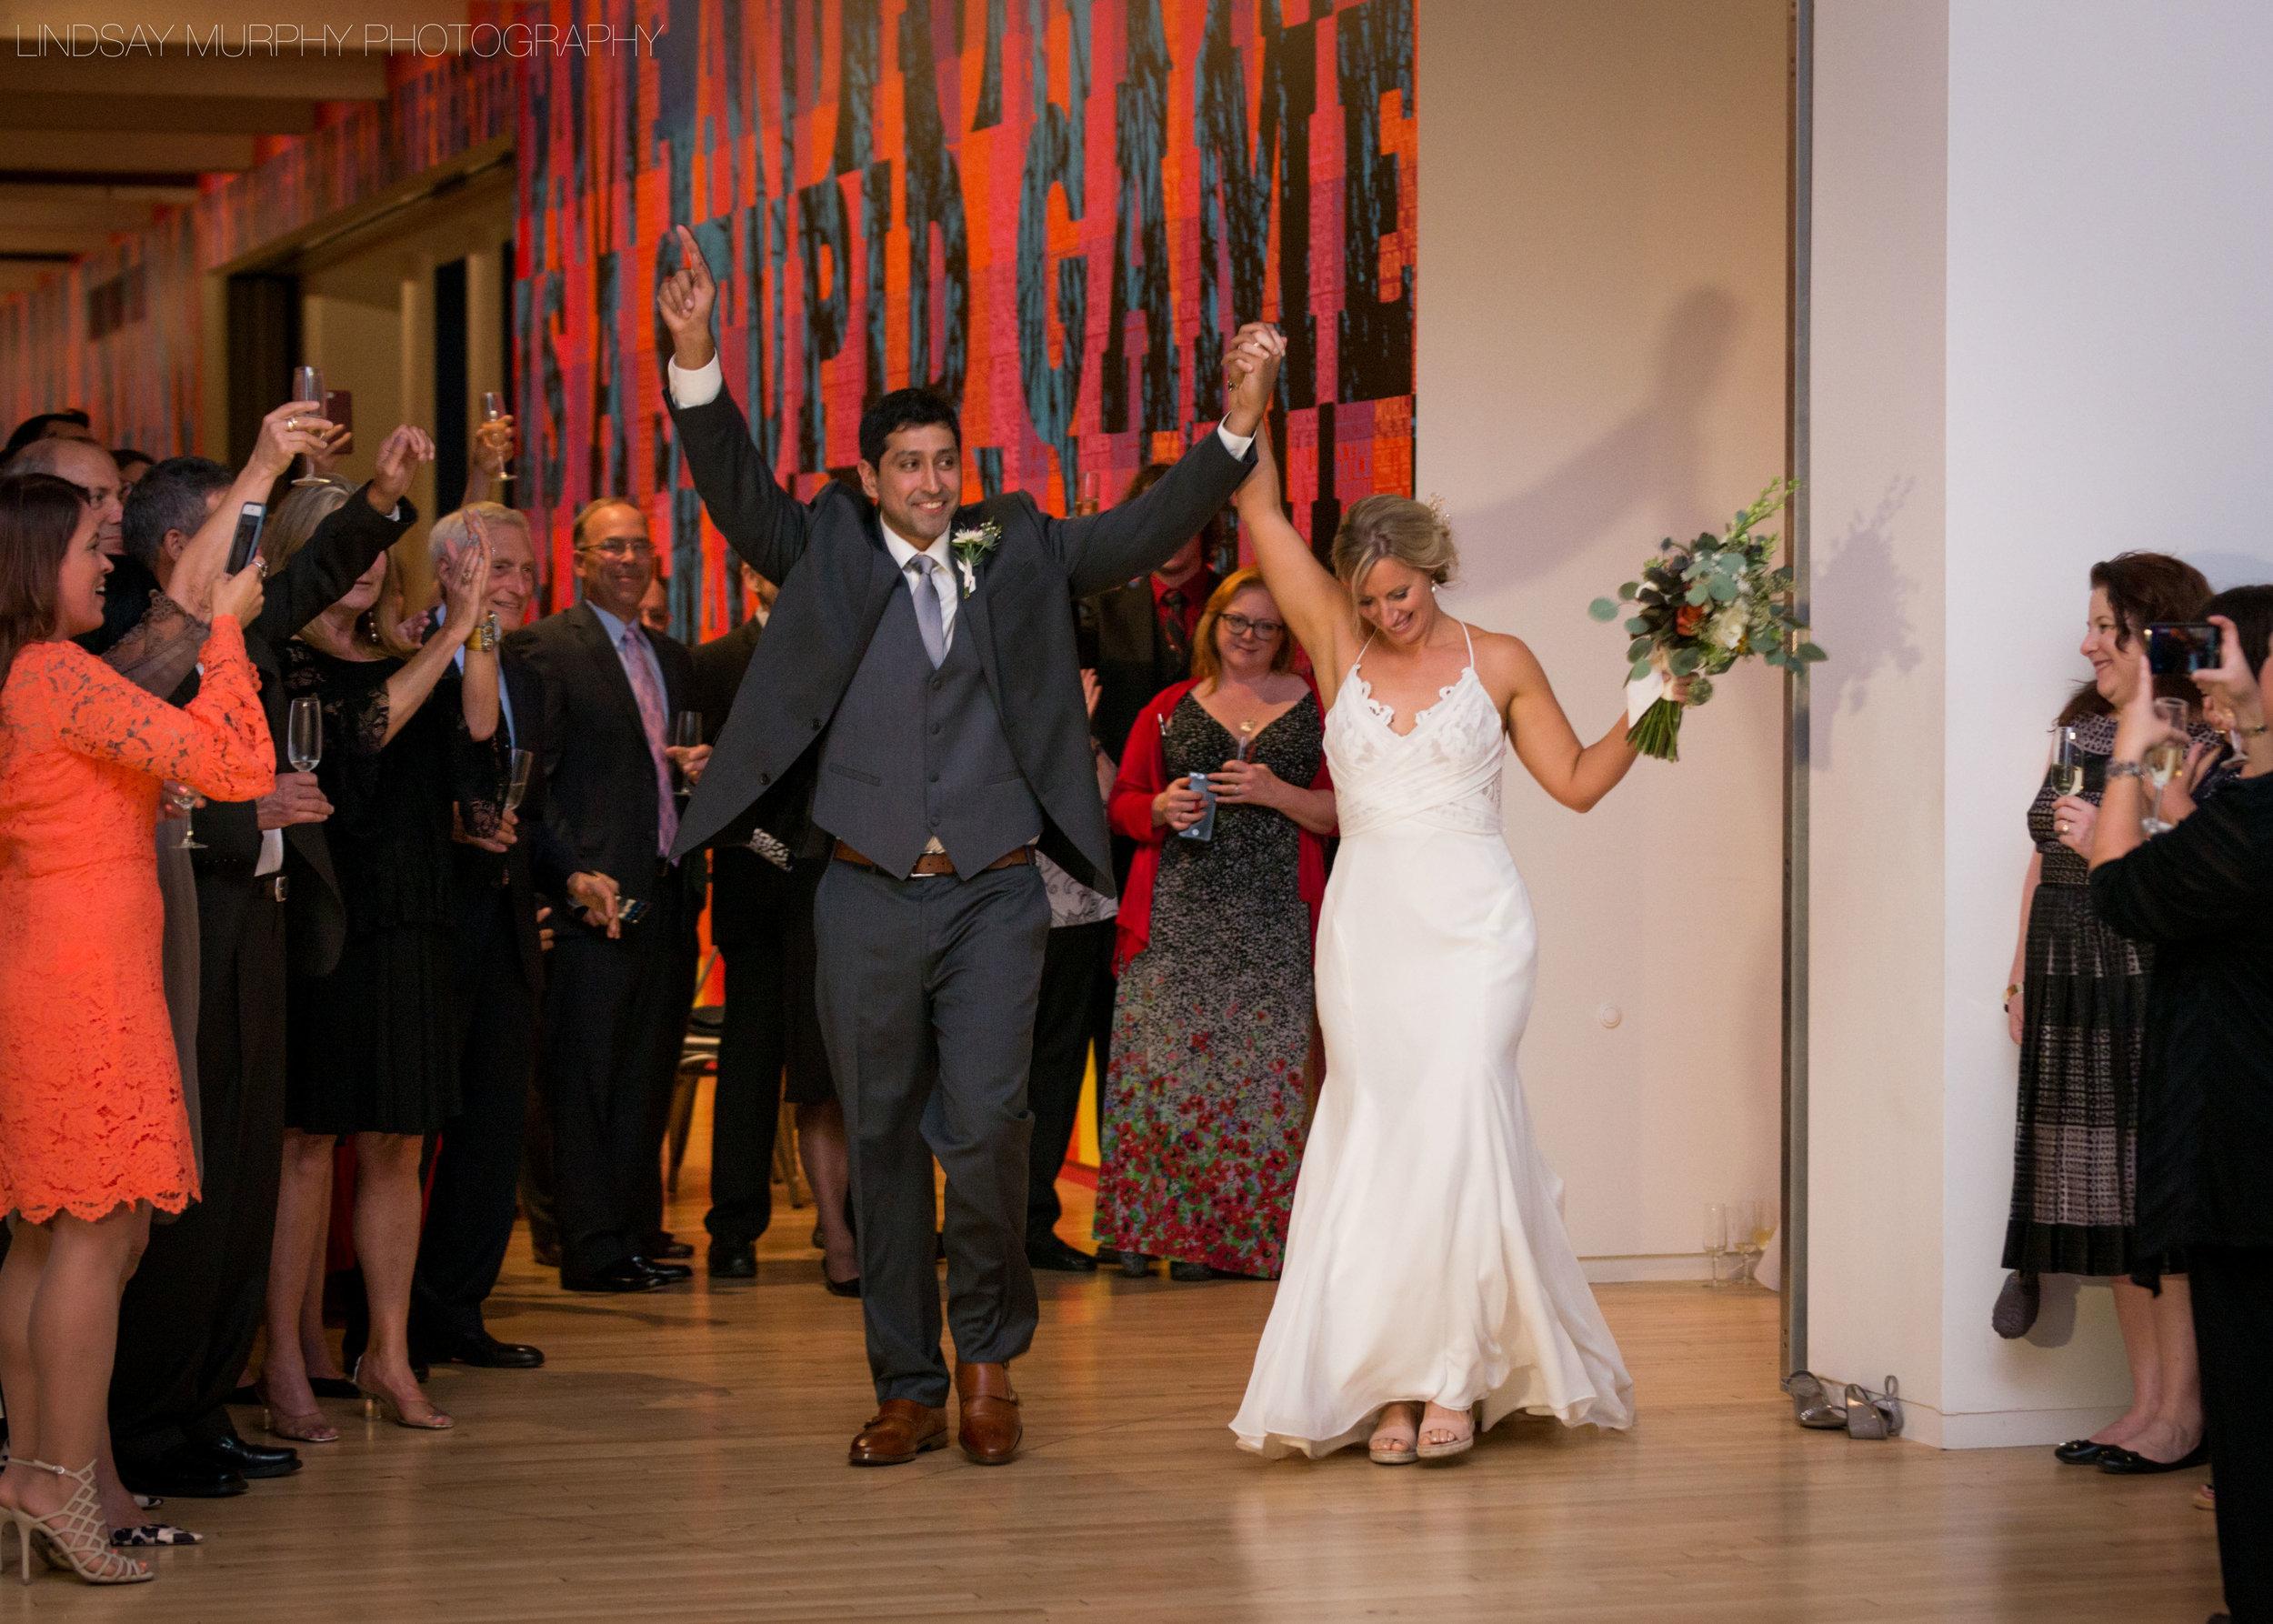 New_England_wedding-33.jpg